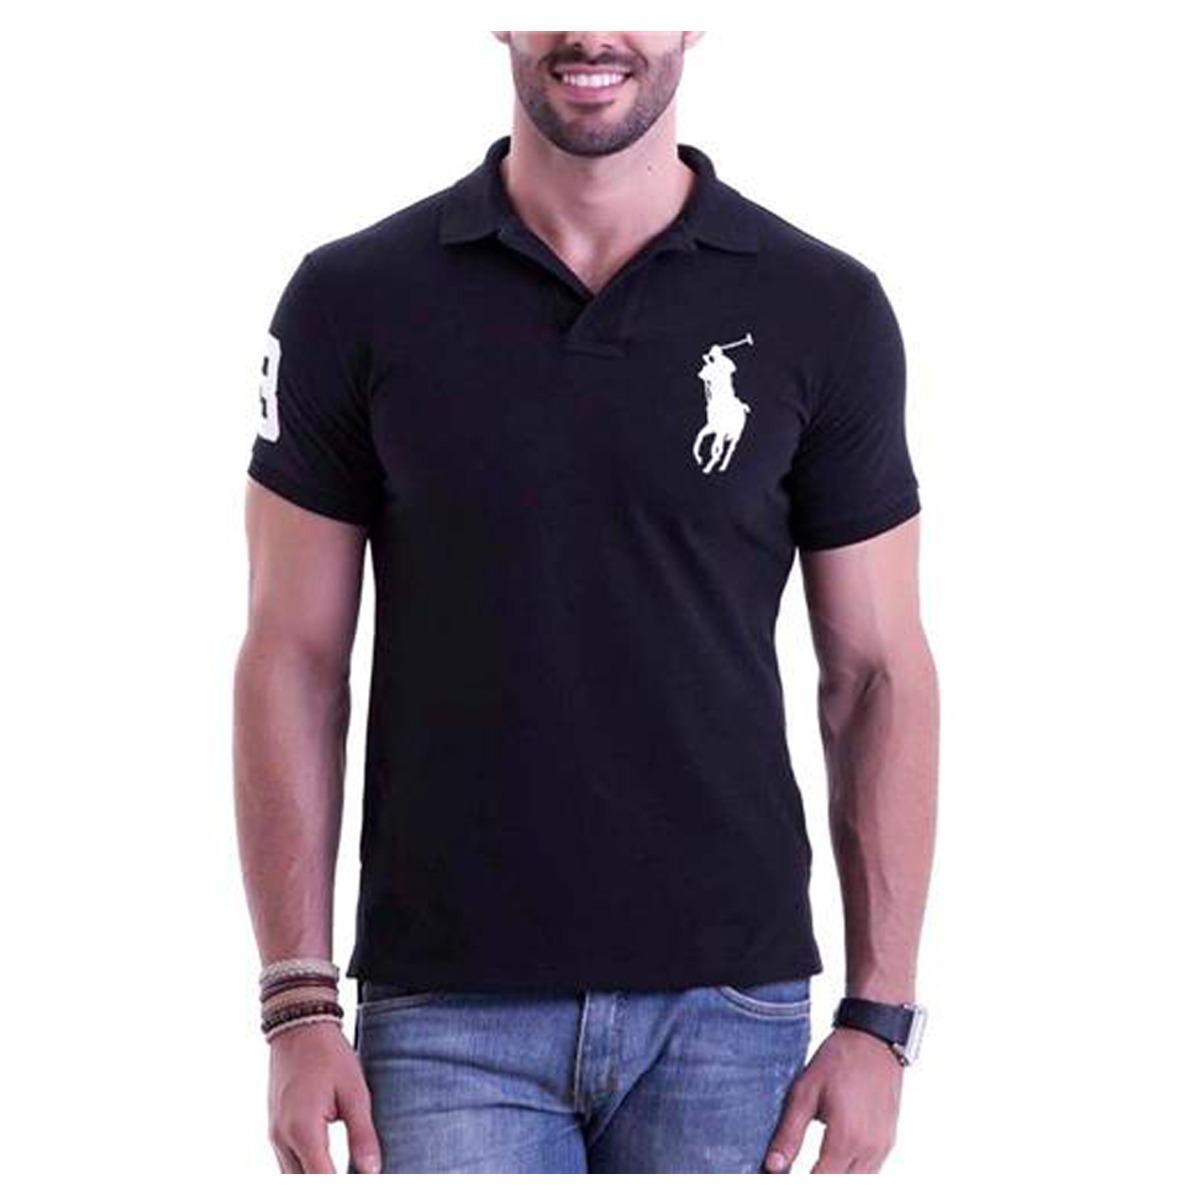 Kit 6 Camisetas Gola Polo Masculina Grandes Marcas Atacado - R  120 ... 0b124b2475b1f